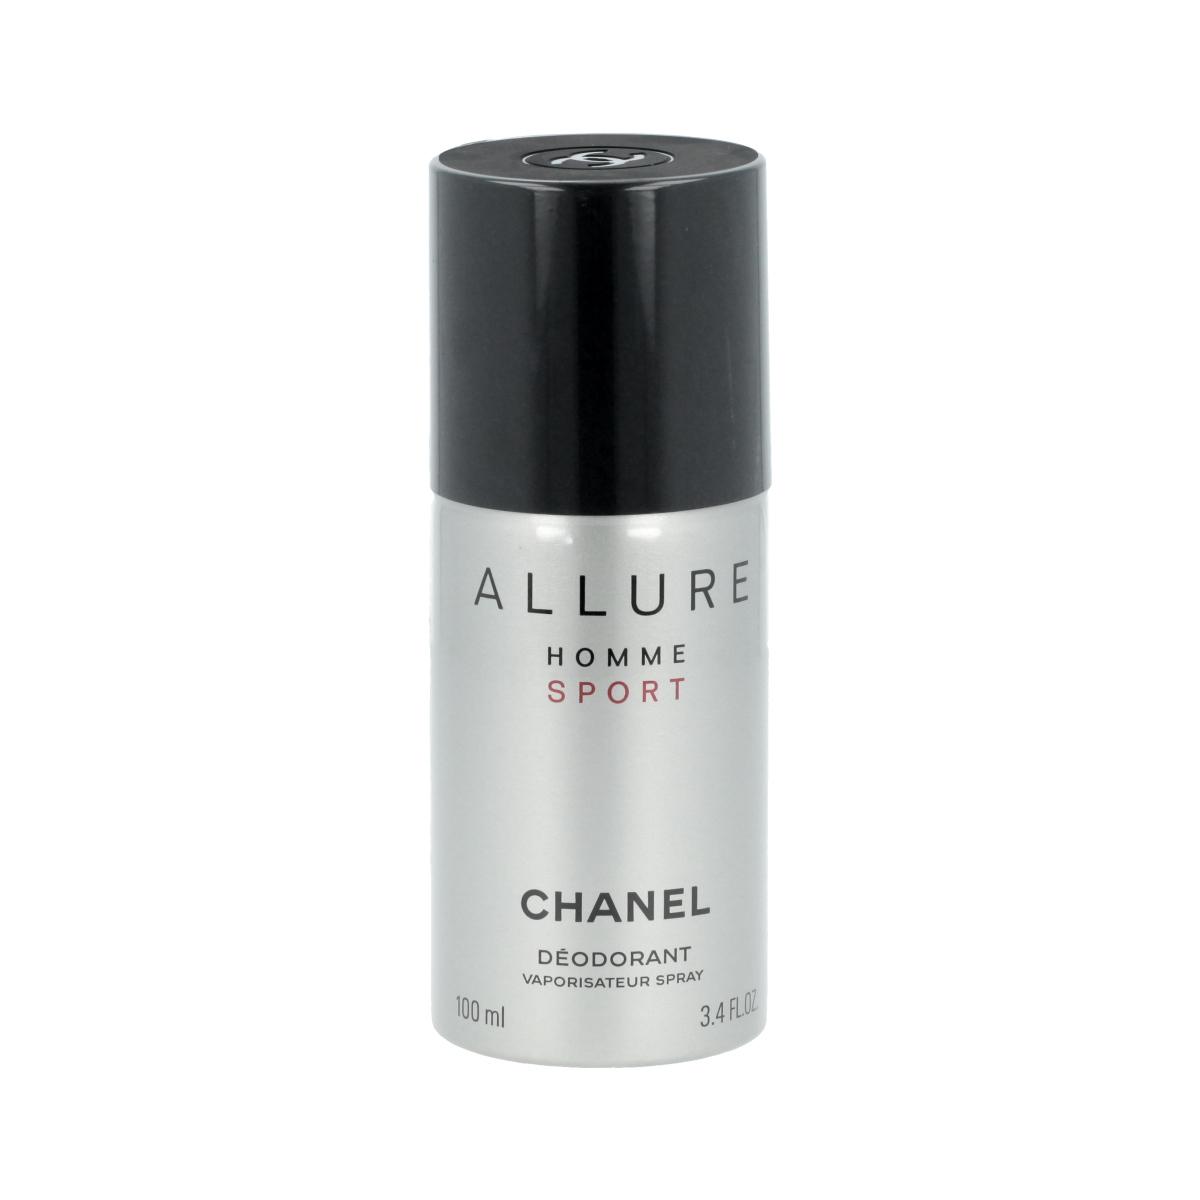 Chanel Allure Homme Sport Deodorant im Spray 100 ml (man) 31610